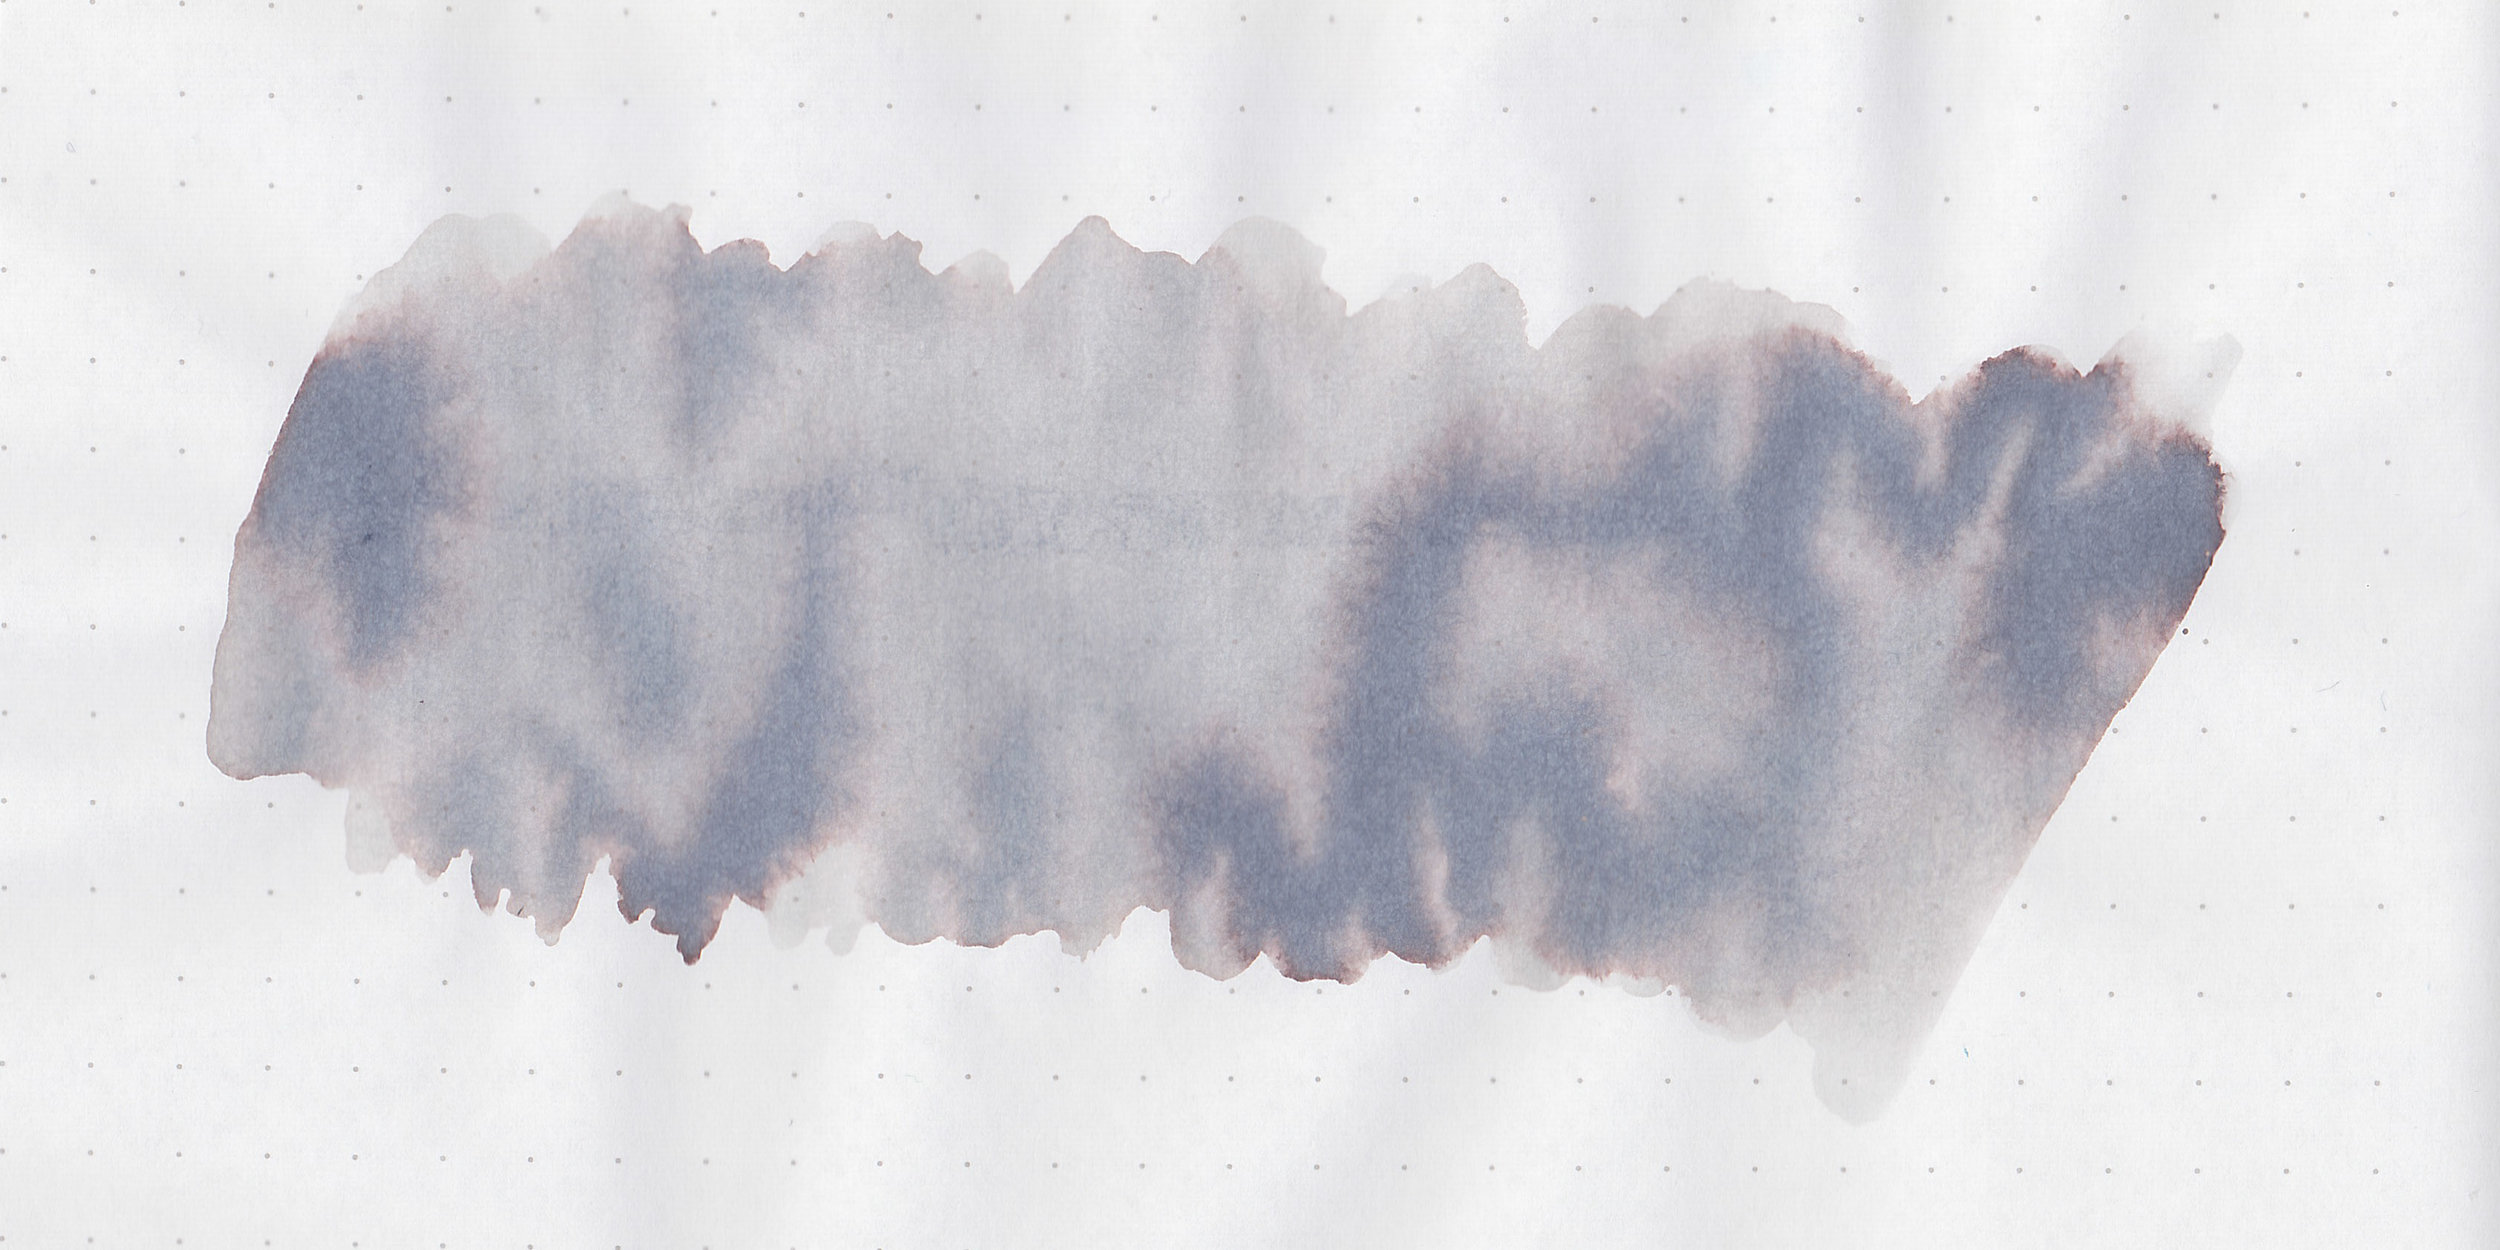 bkb-ground-rattler-3.jpg